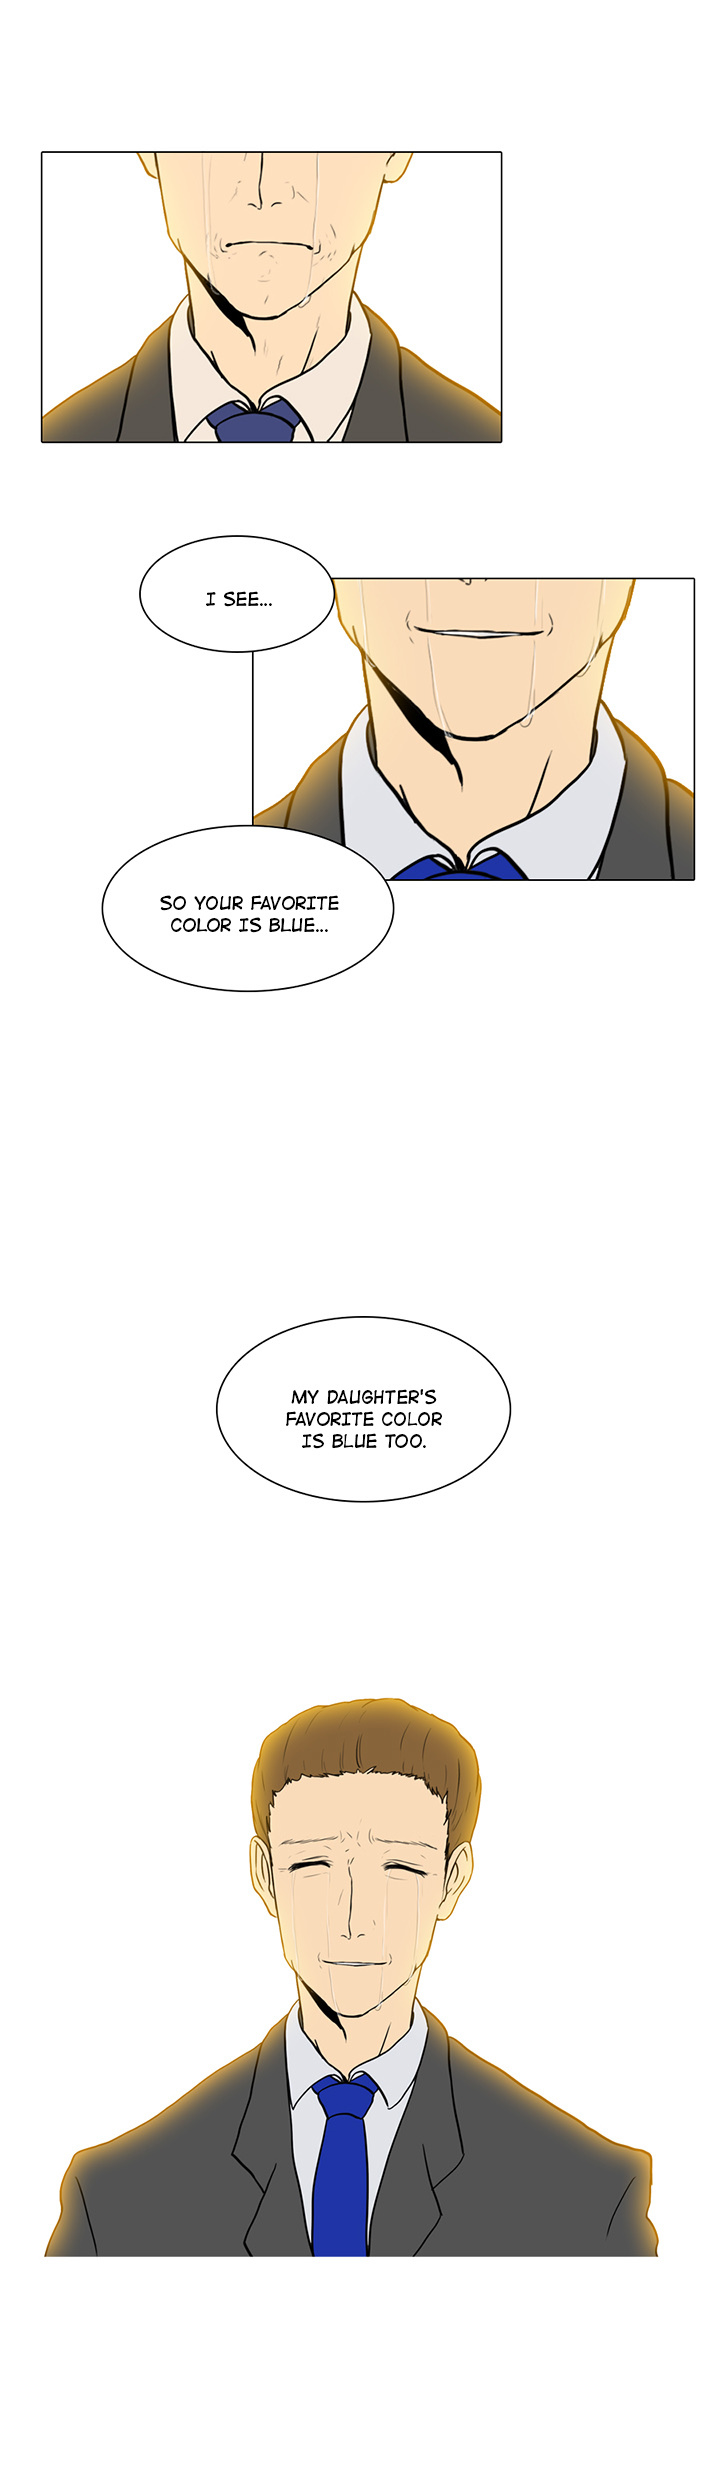 https://img2.nineanime.com/comics/pic2/13/27725/723050/ec0654ecb4284e98366b7596a15c5e1b.jpg Page 1